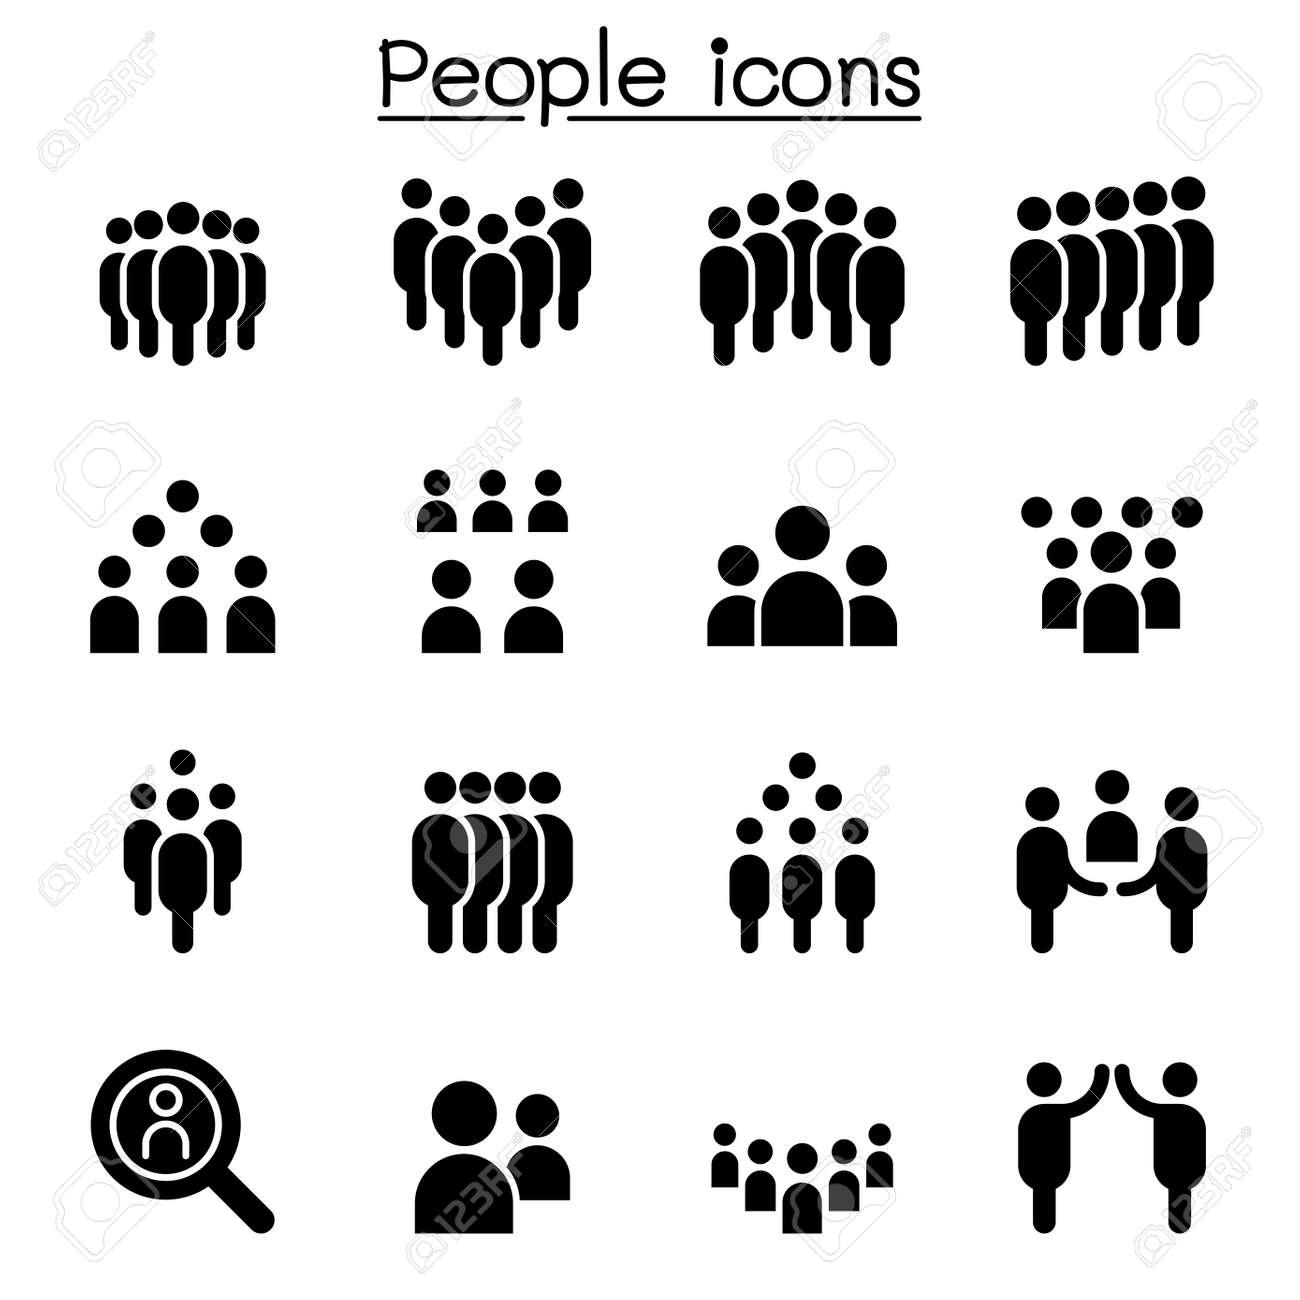 People icon set vector illustration - 80265409